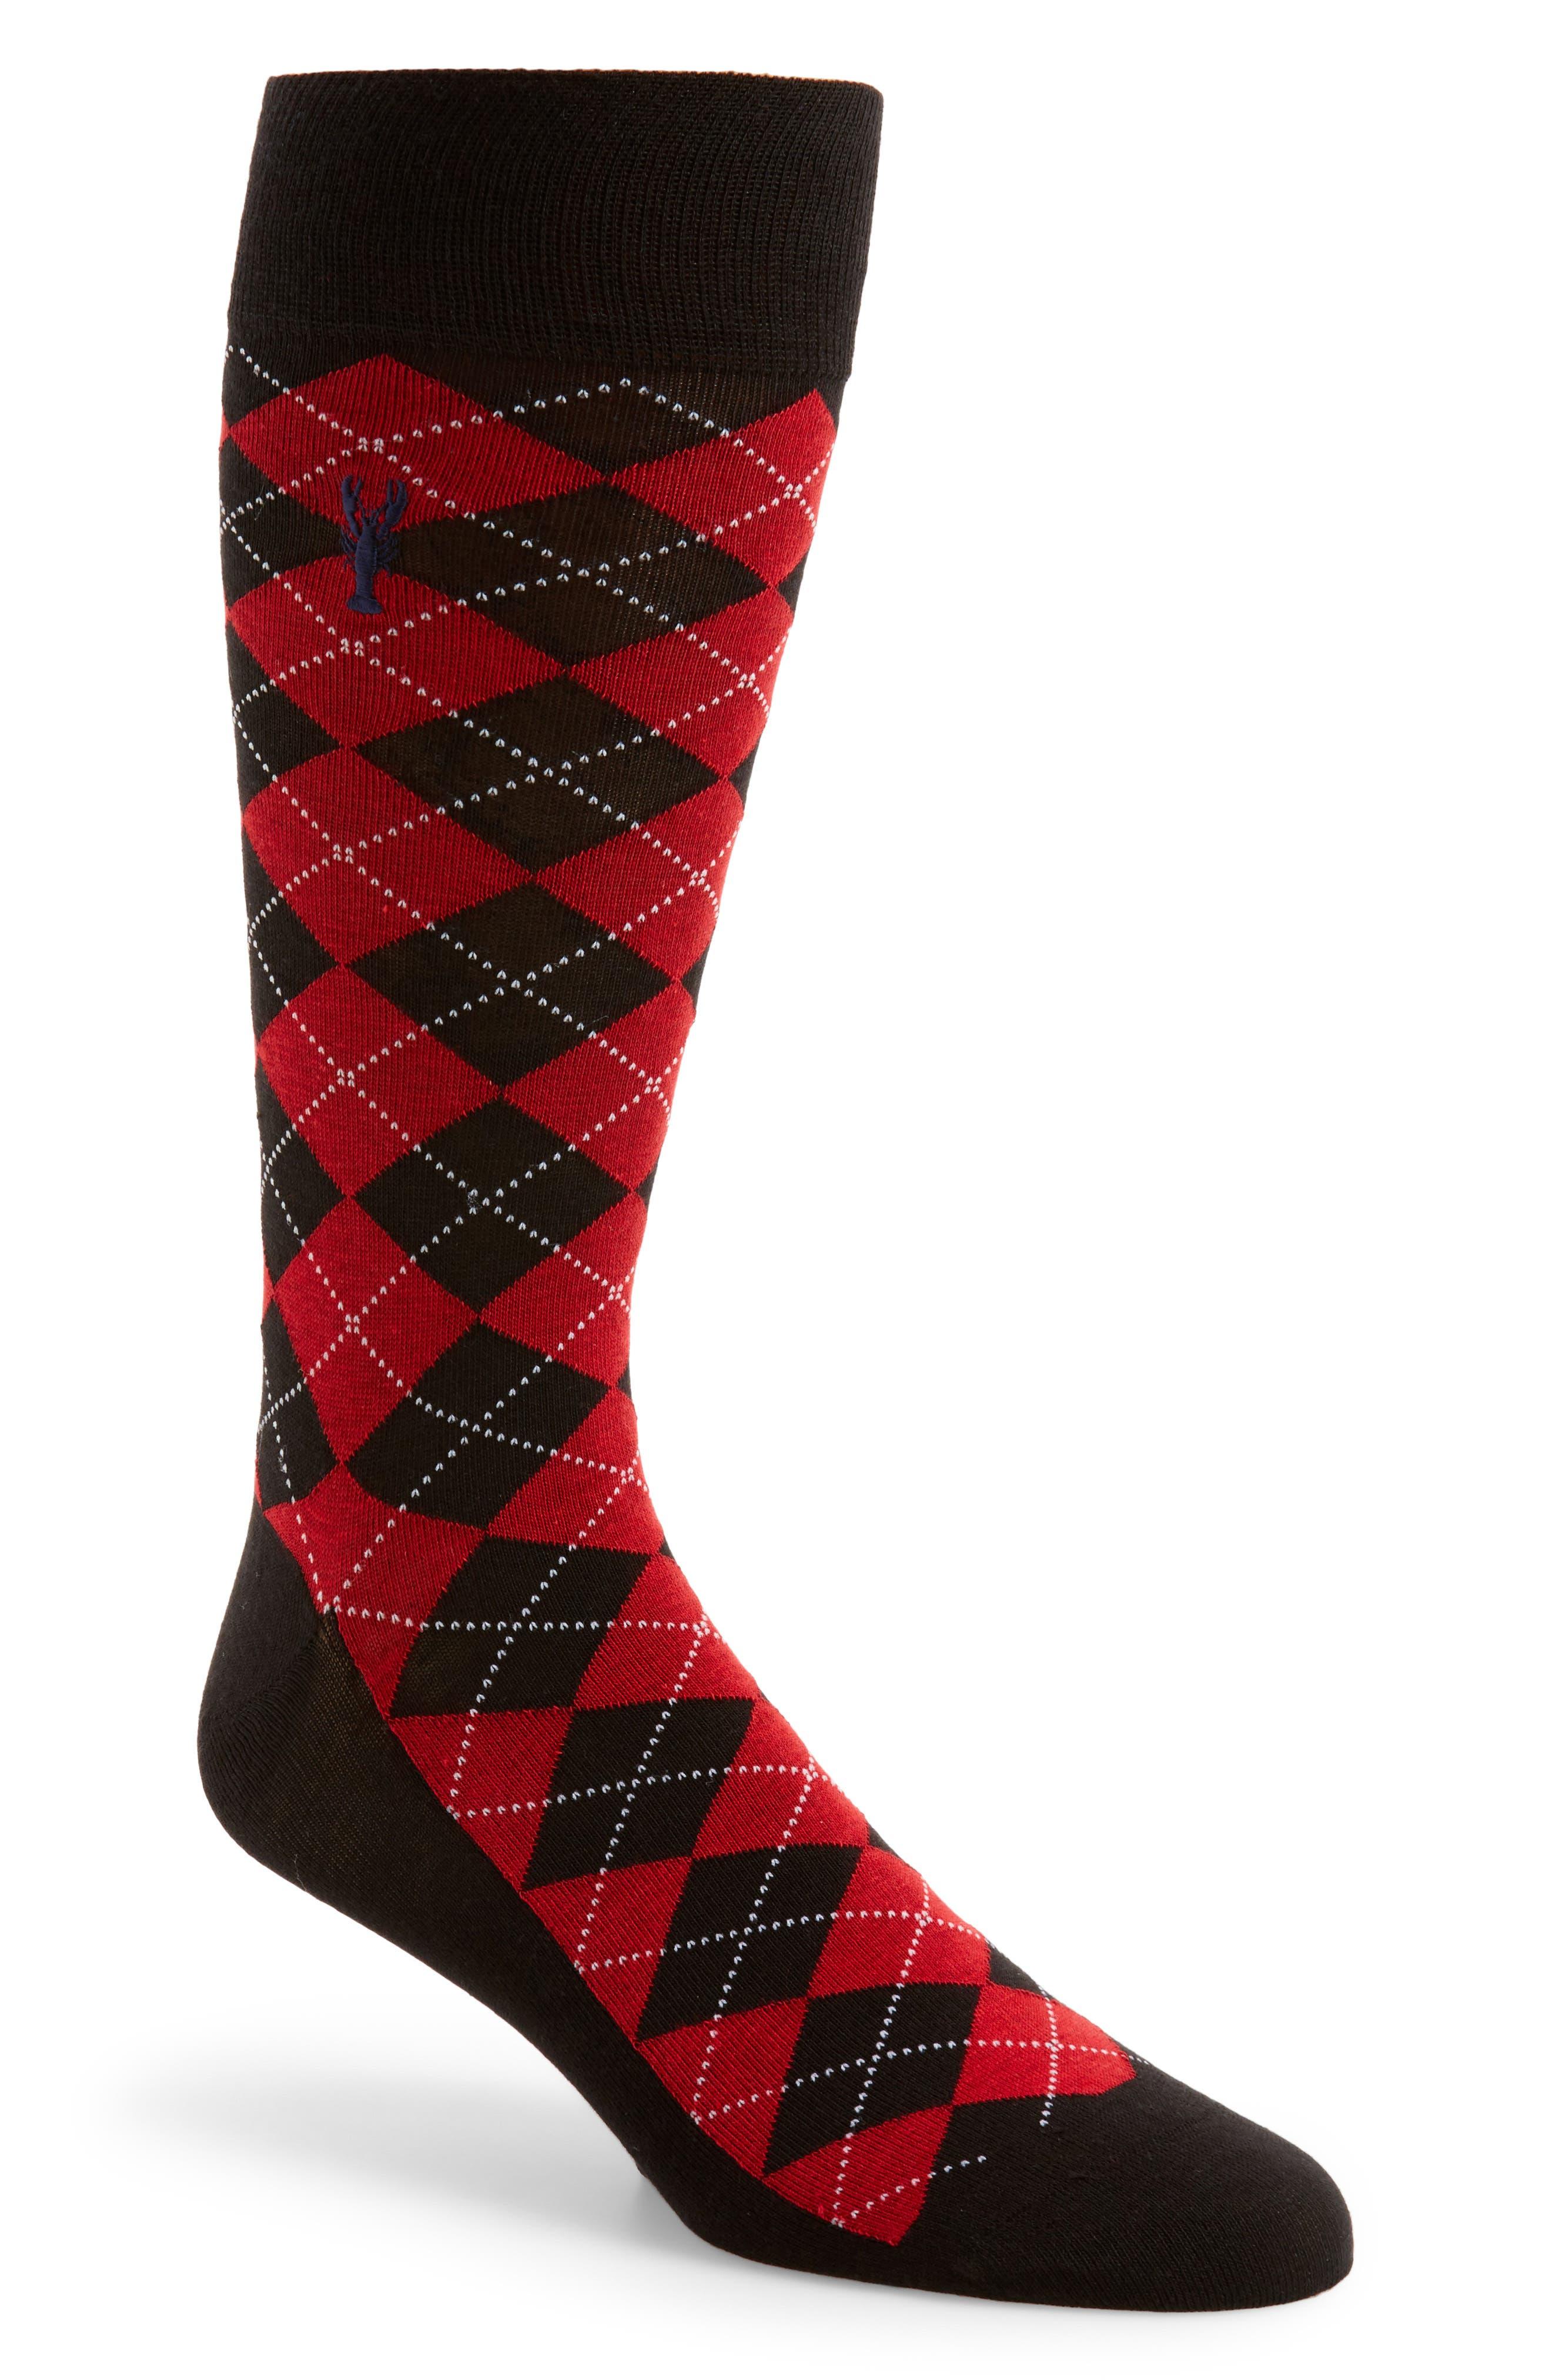 Pinch Argyle Socks,                             Main thumbnail 1, color,                             Black/ Red